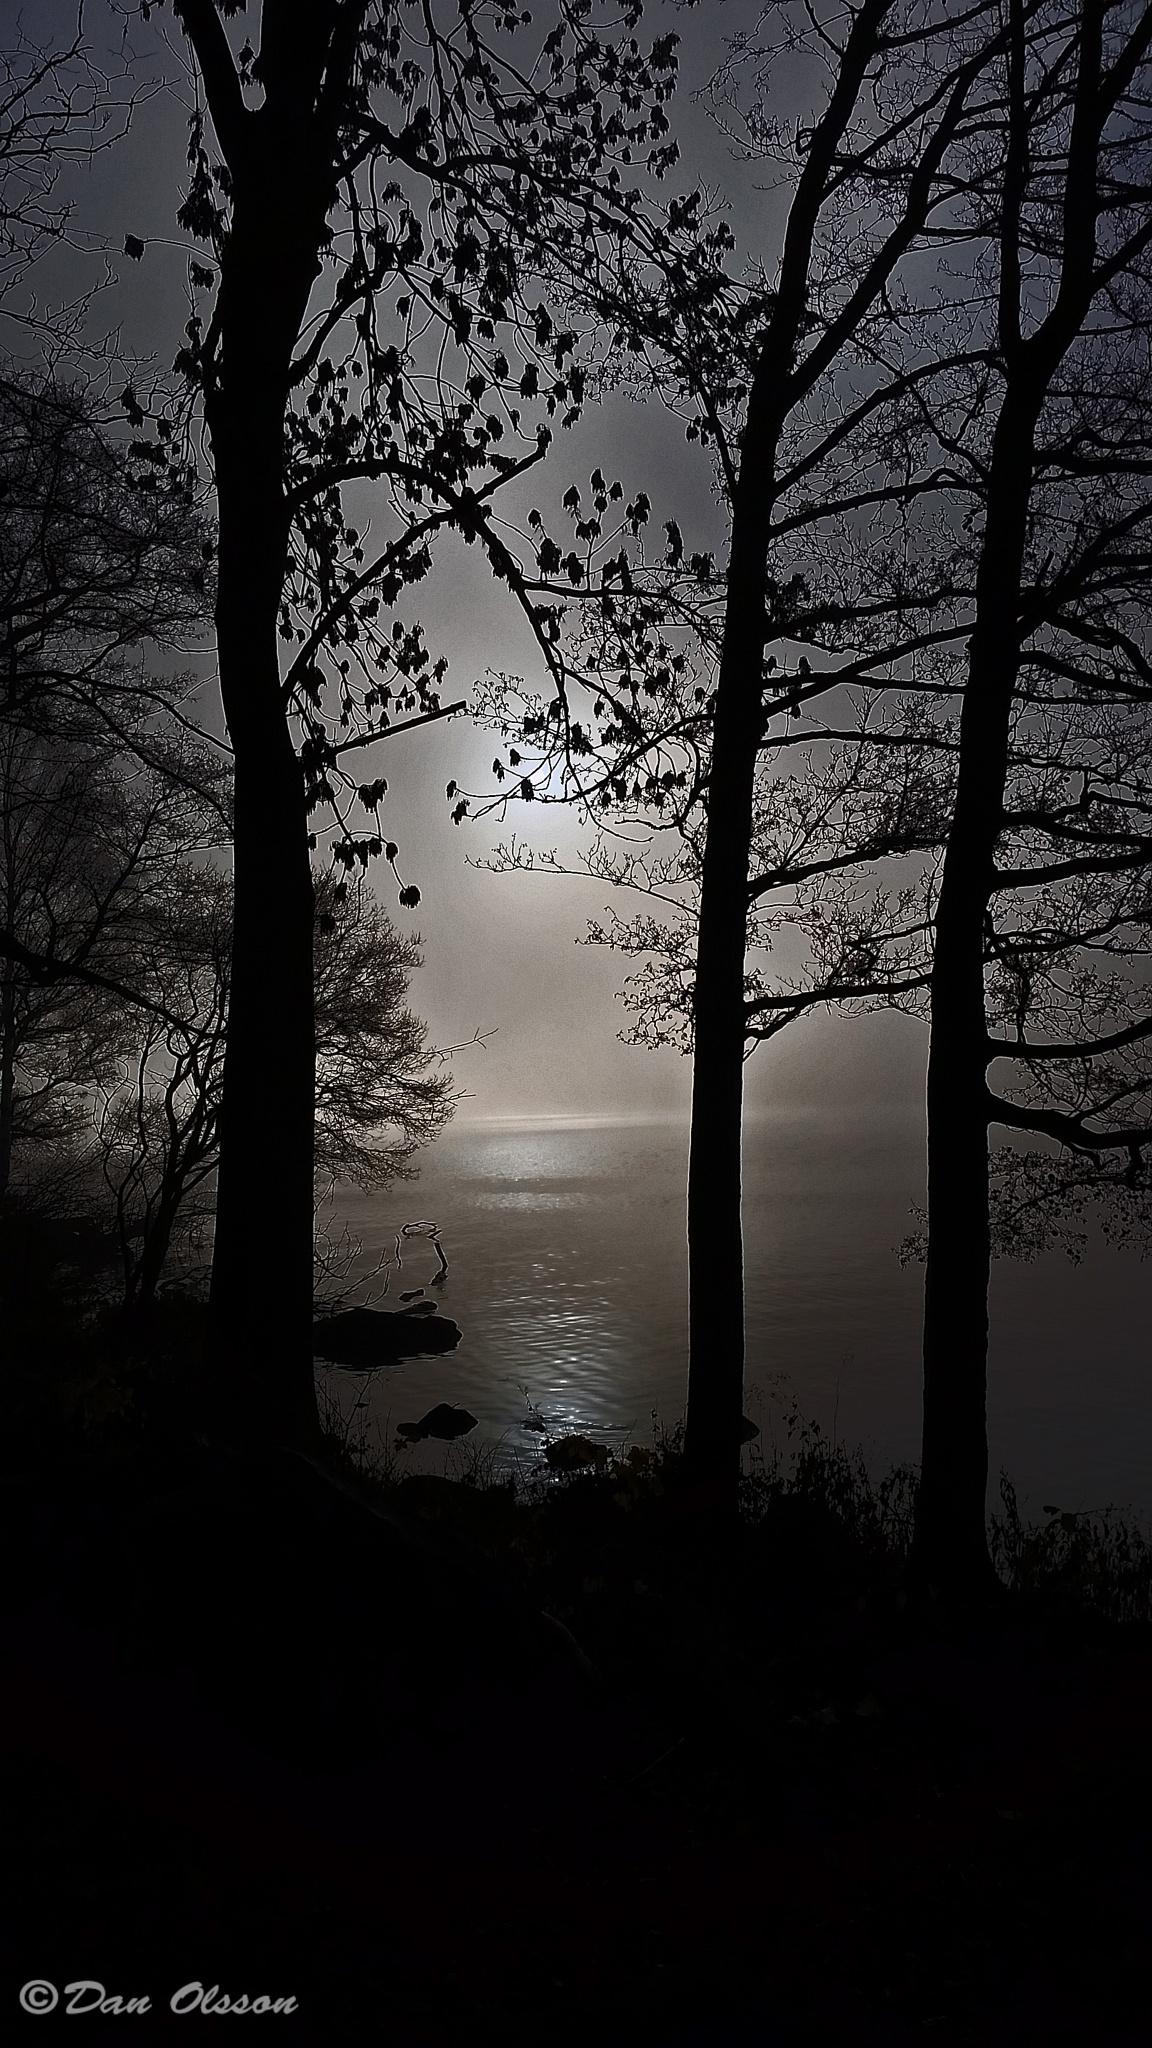 Motljus i dimma, Ålsten (Into the sun in mist) by Dan Olsson